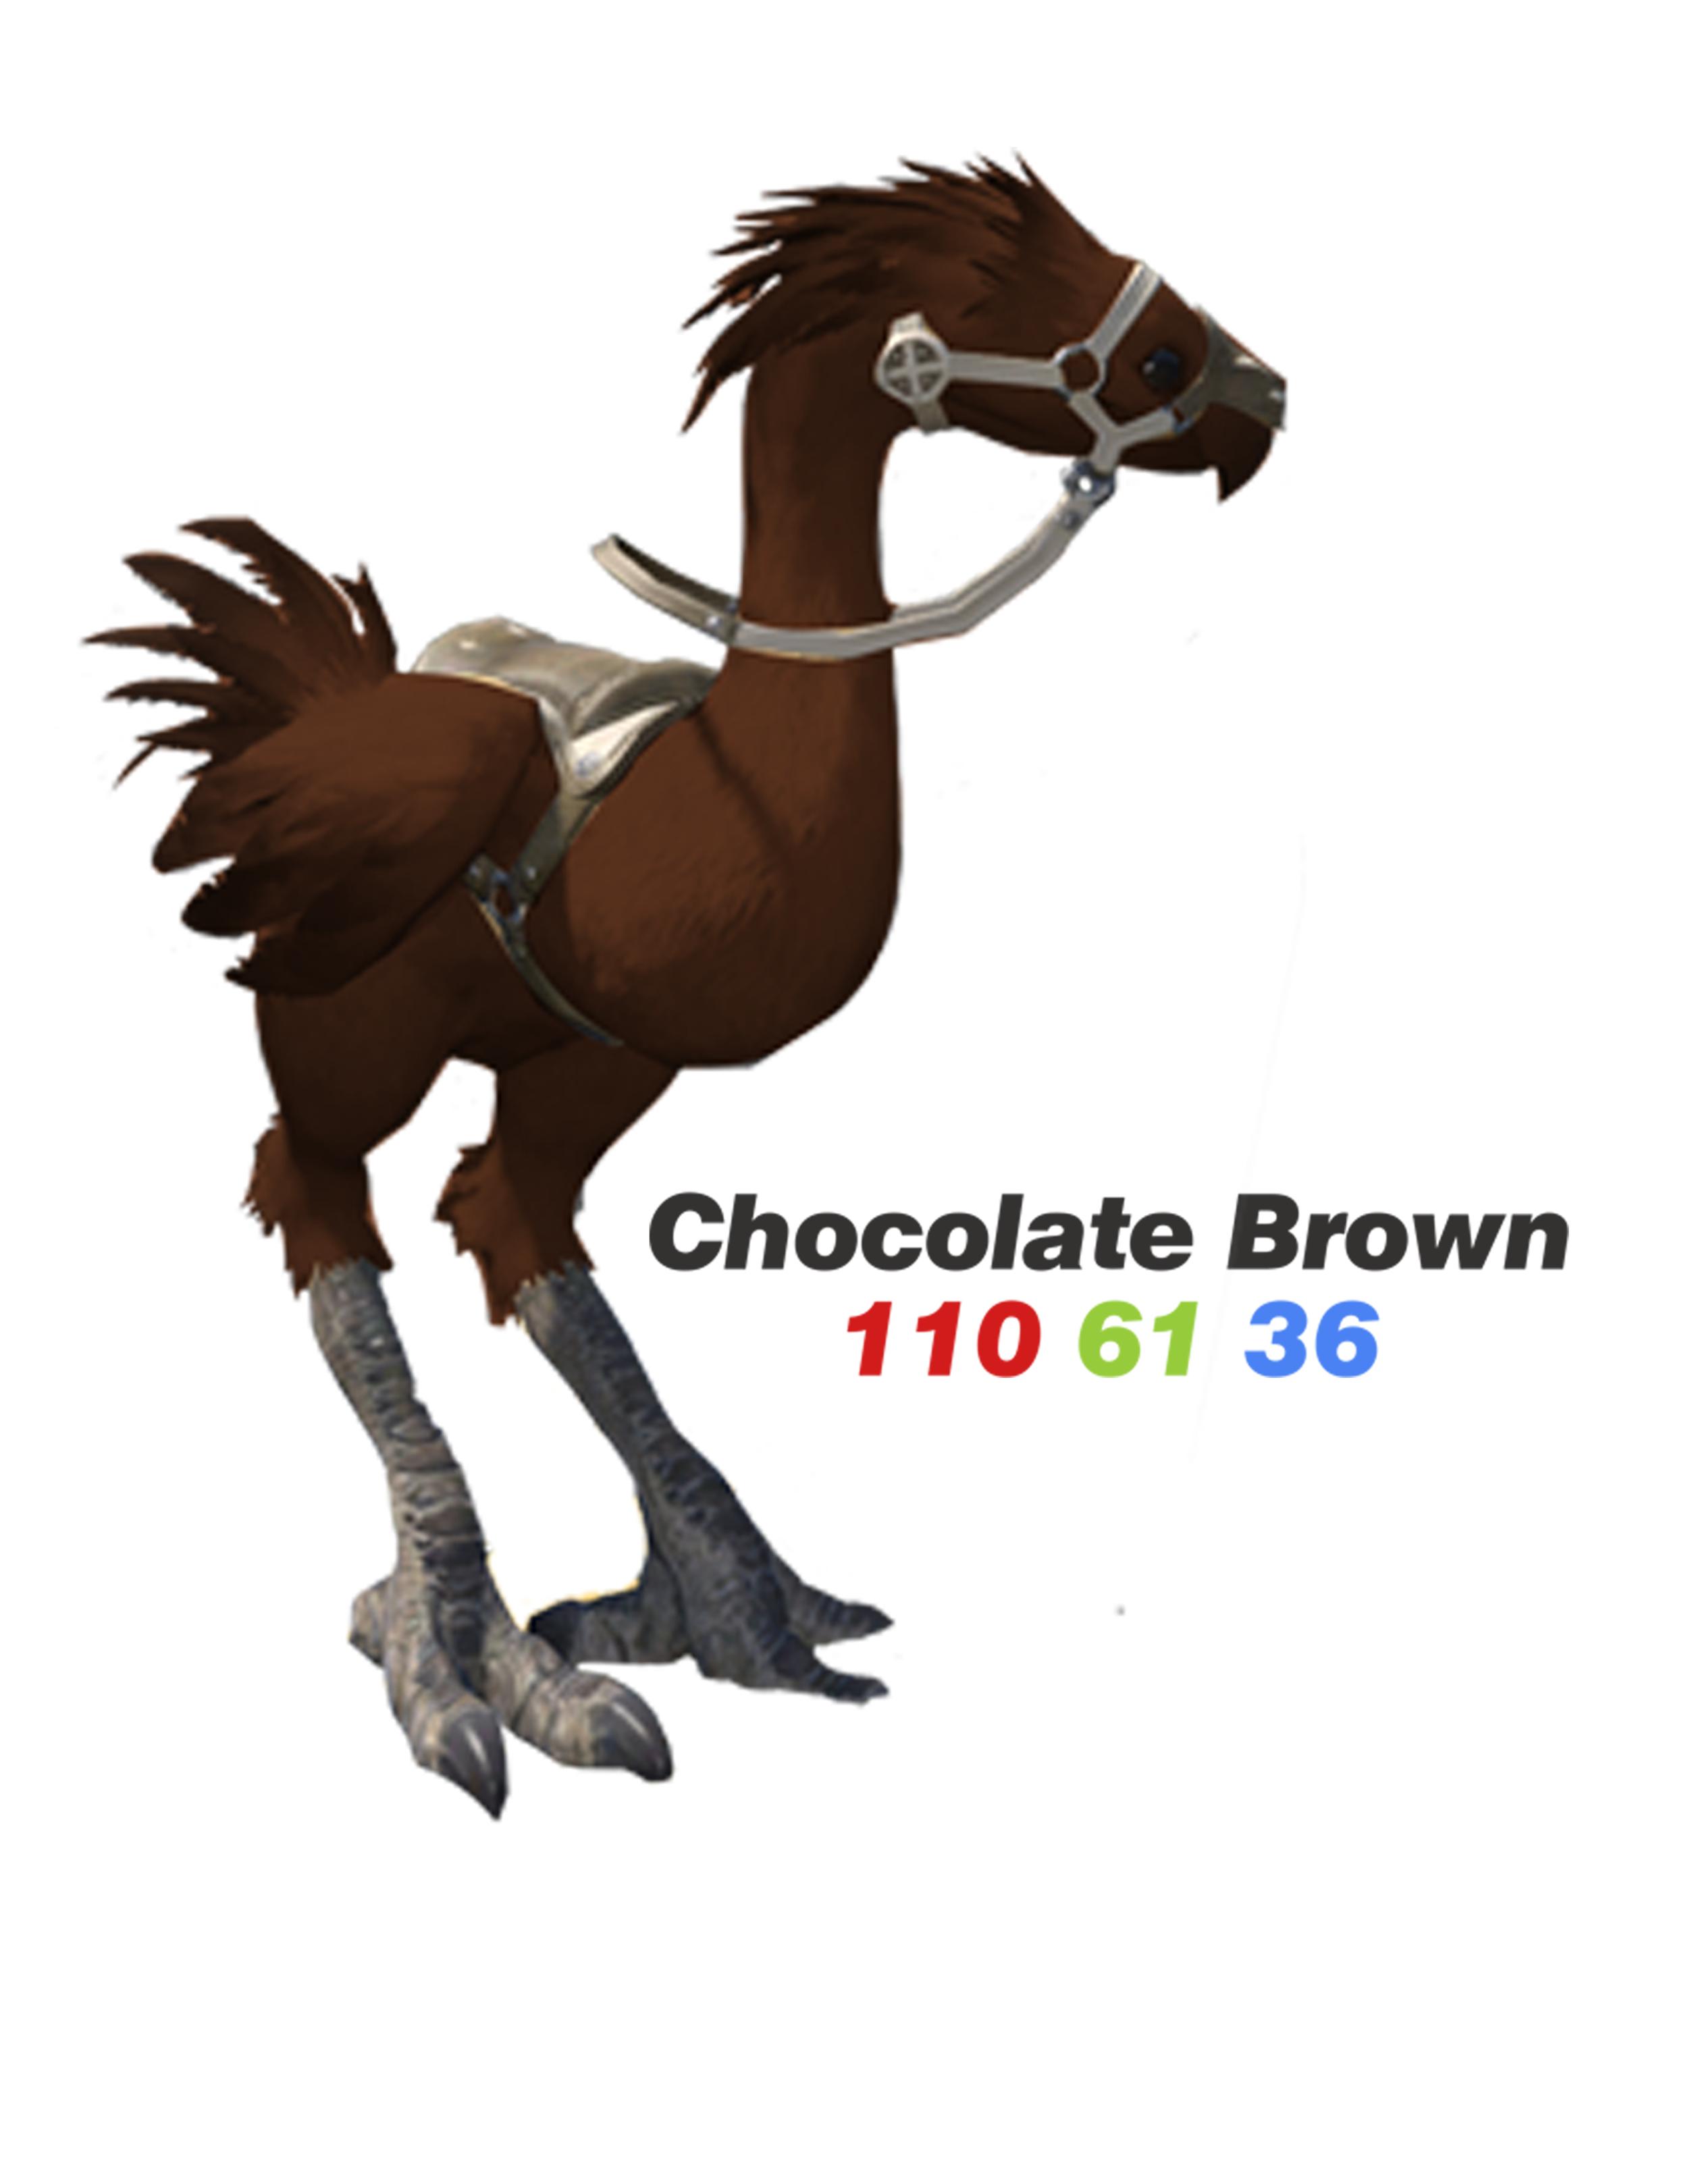 ChocBrown.png